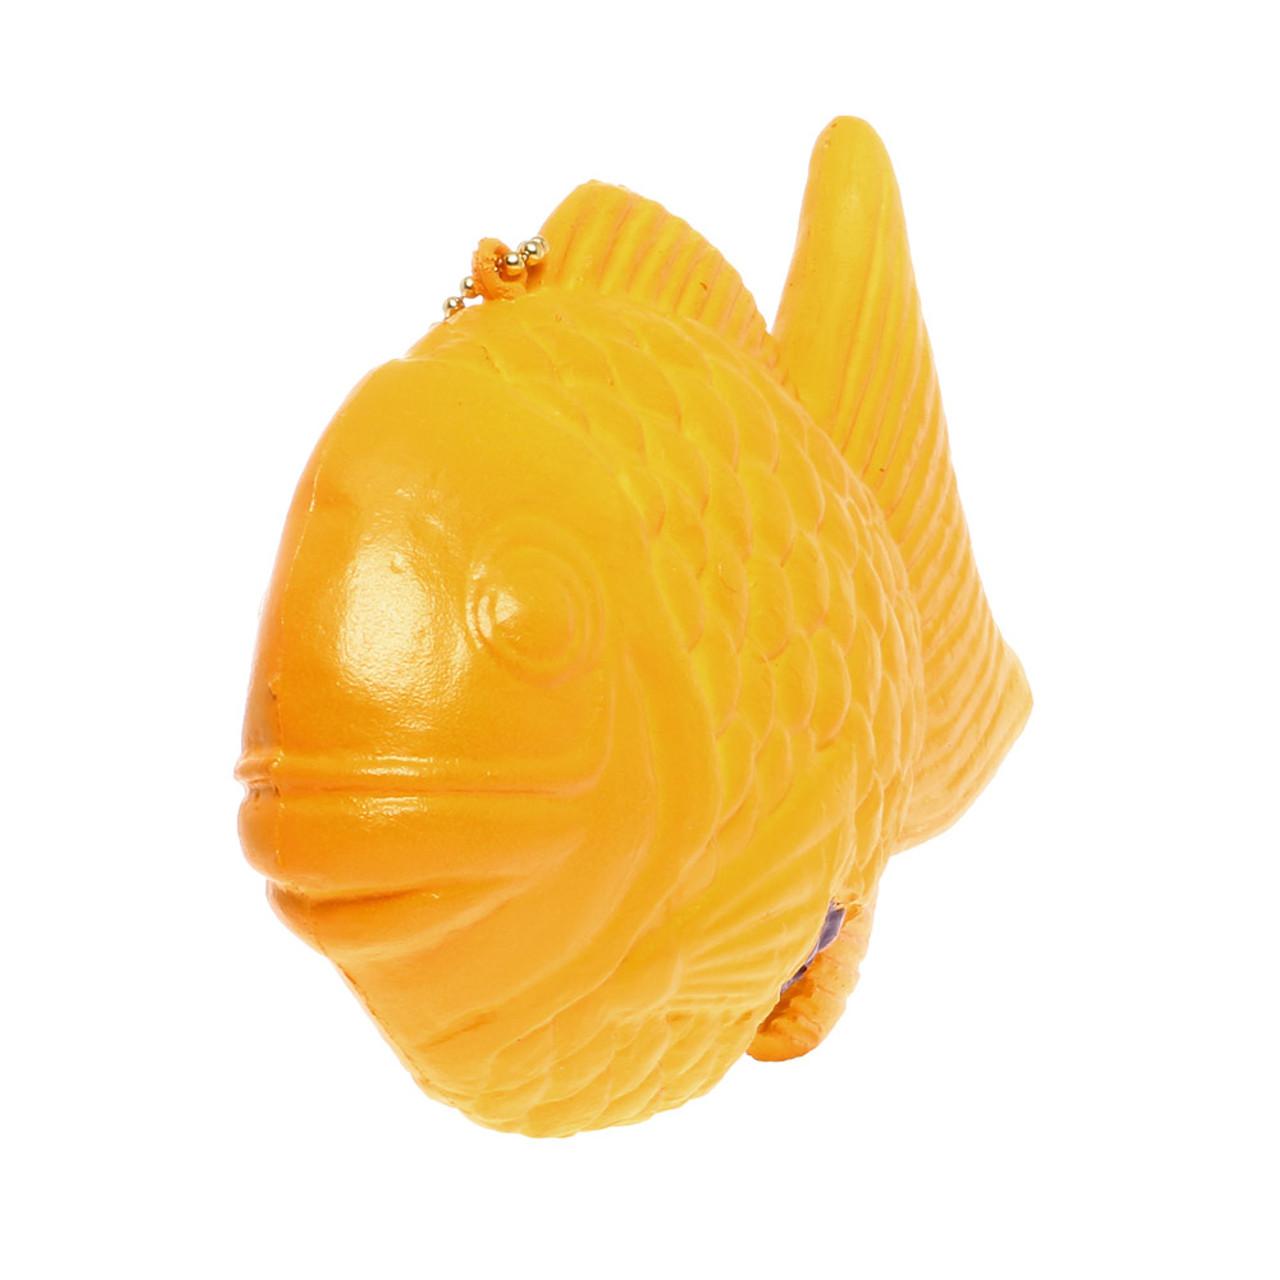 NIC Taiyaki Fish Shaped Cake Squishy Toy Charm ( Side View )